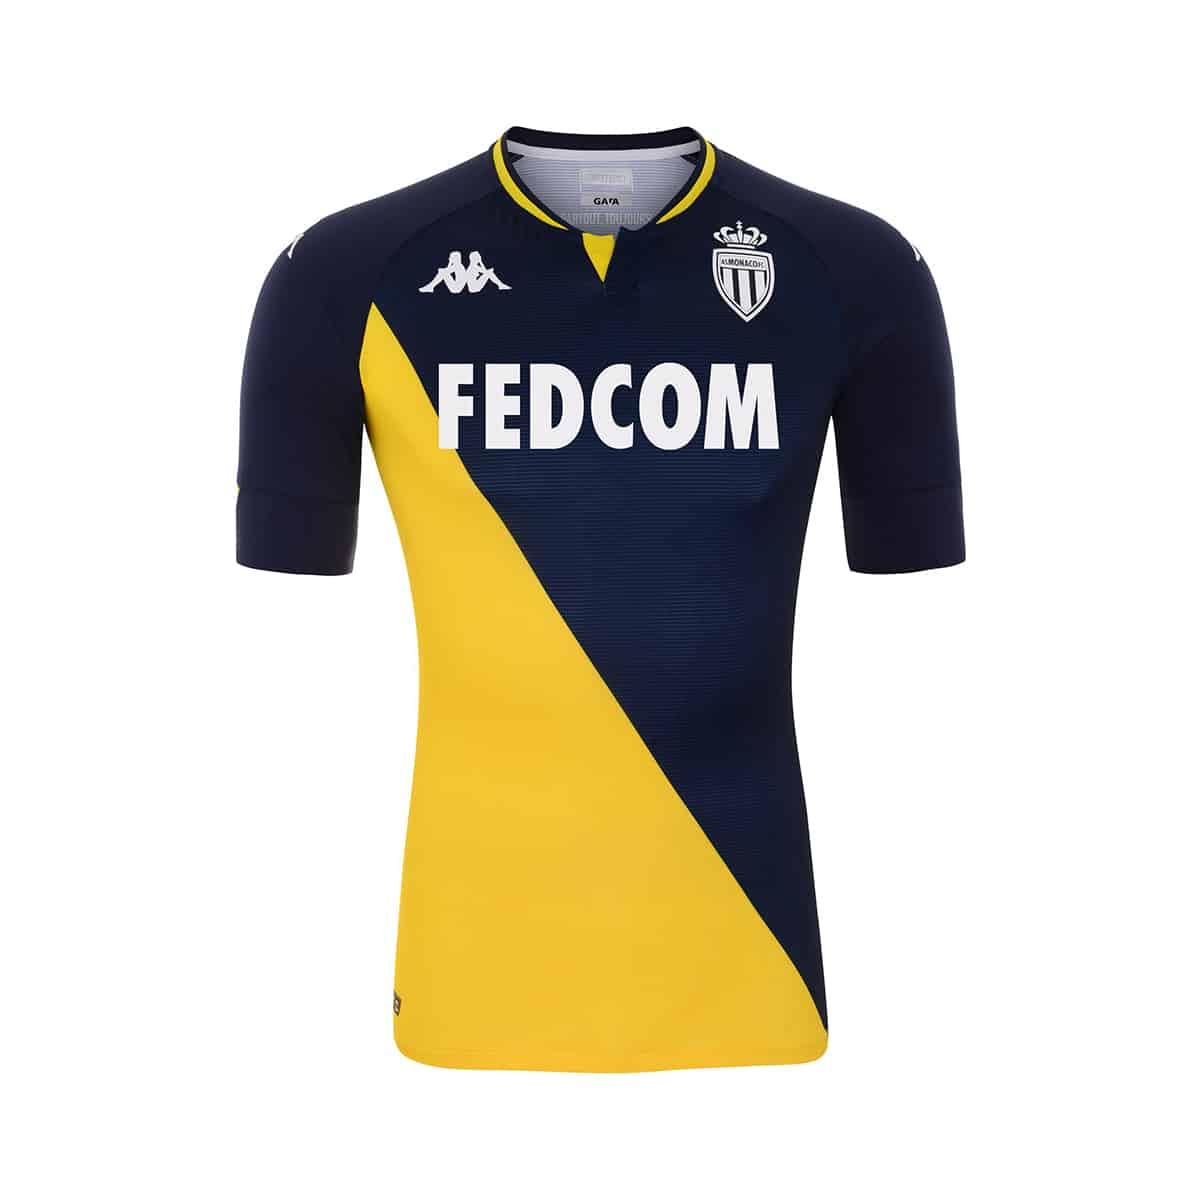 maillot-exterieur-as-monaco-2020-2021-kappa-1